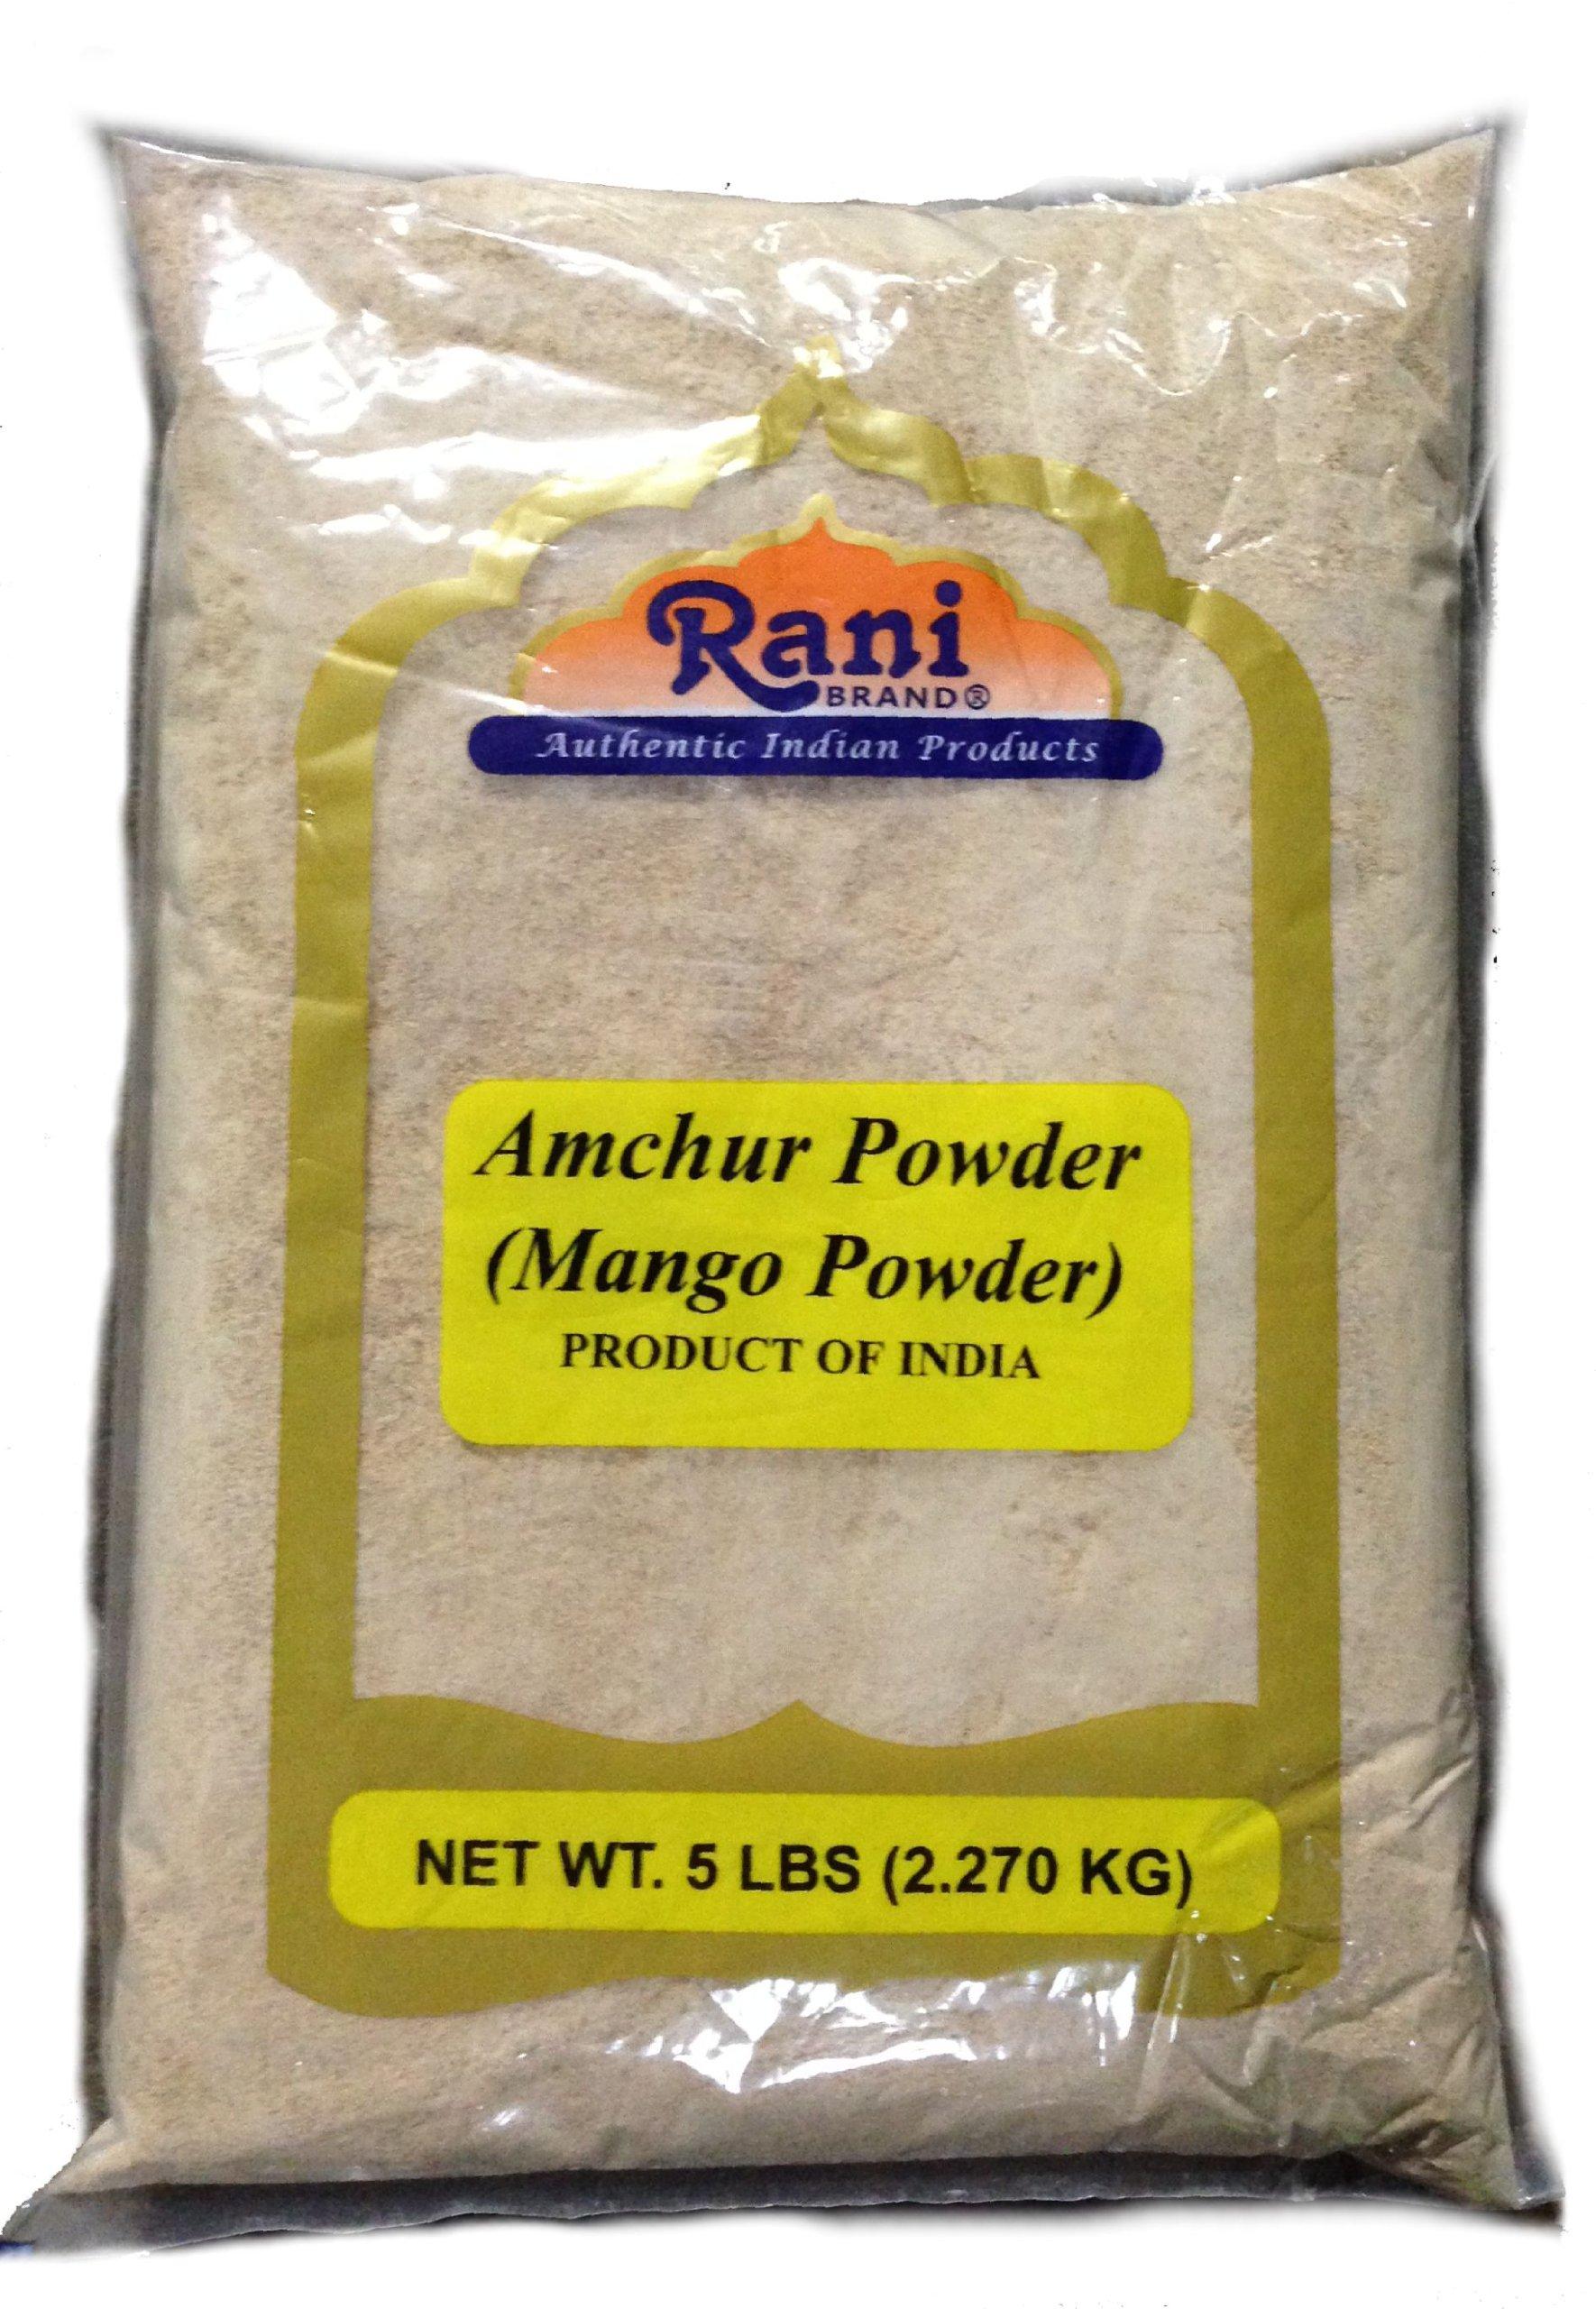 Rani Amchur (Mango) Ground Powder 80oz (5lbs) Bulk Poly ~ All Natural, Indian Origin | No Color | Gluten Free Ingredients | Vegan | NON-GMO | No Salt or fillers